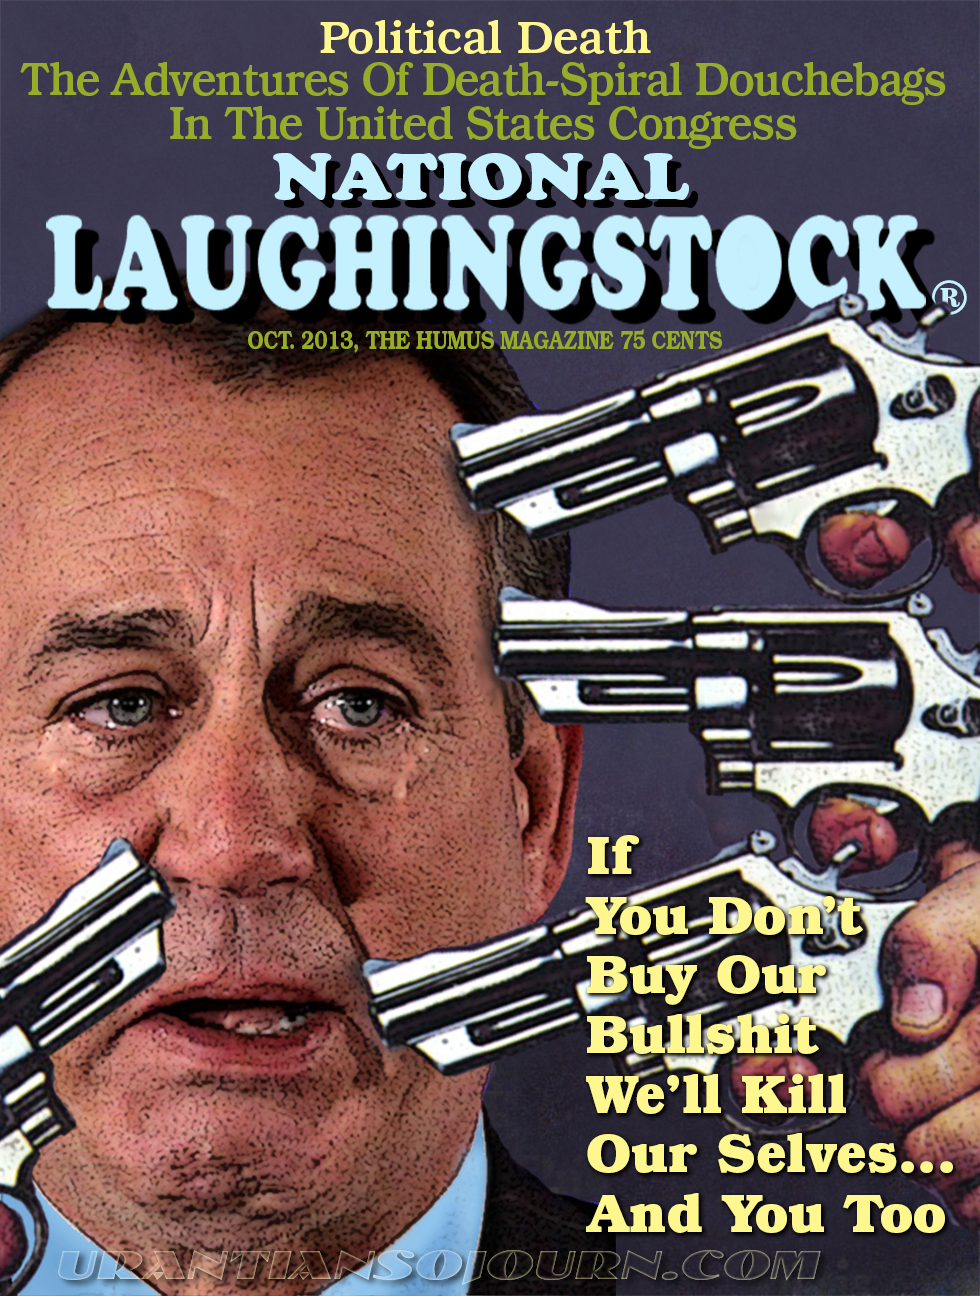 NATIONAL LAUGHINGSTOCK